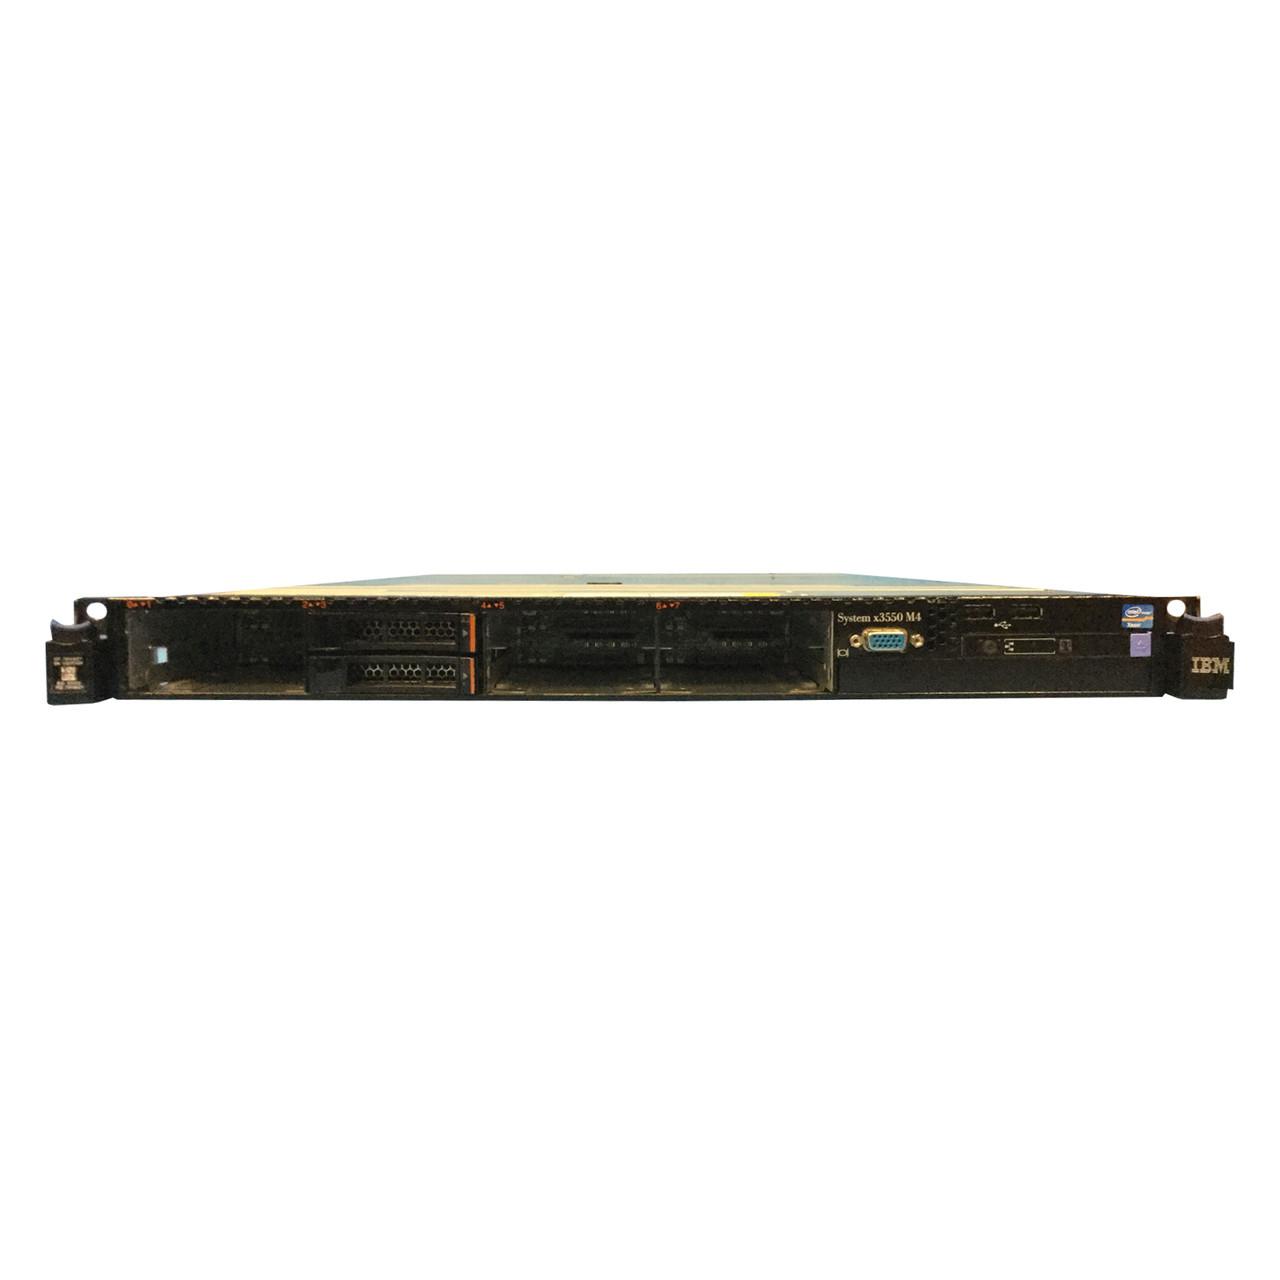 Refurbished Ibm X3550 M4 Sff Configured To Order Ibm 7914 Ac1 Serverworlds